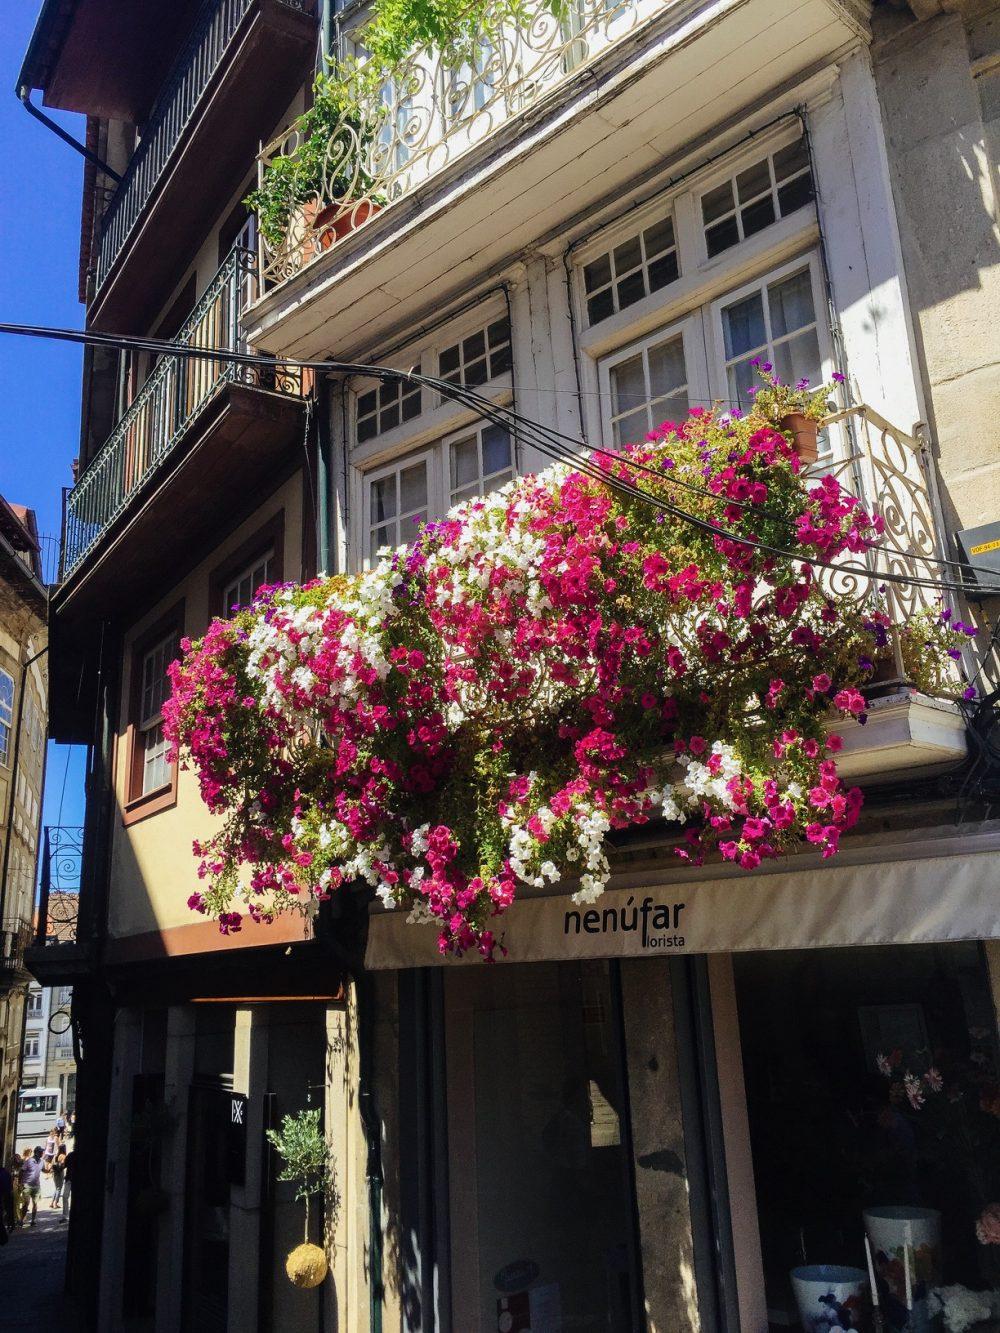 The historic centre of Guimaraes